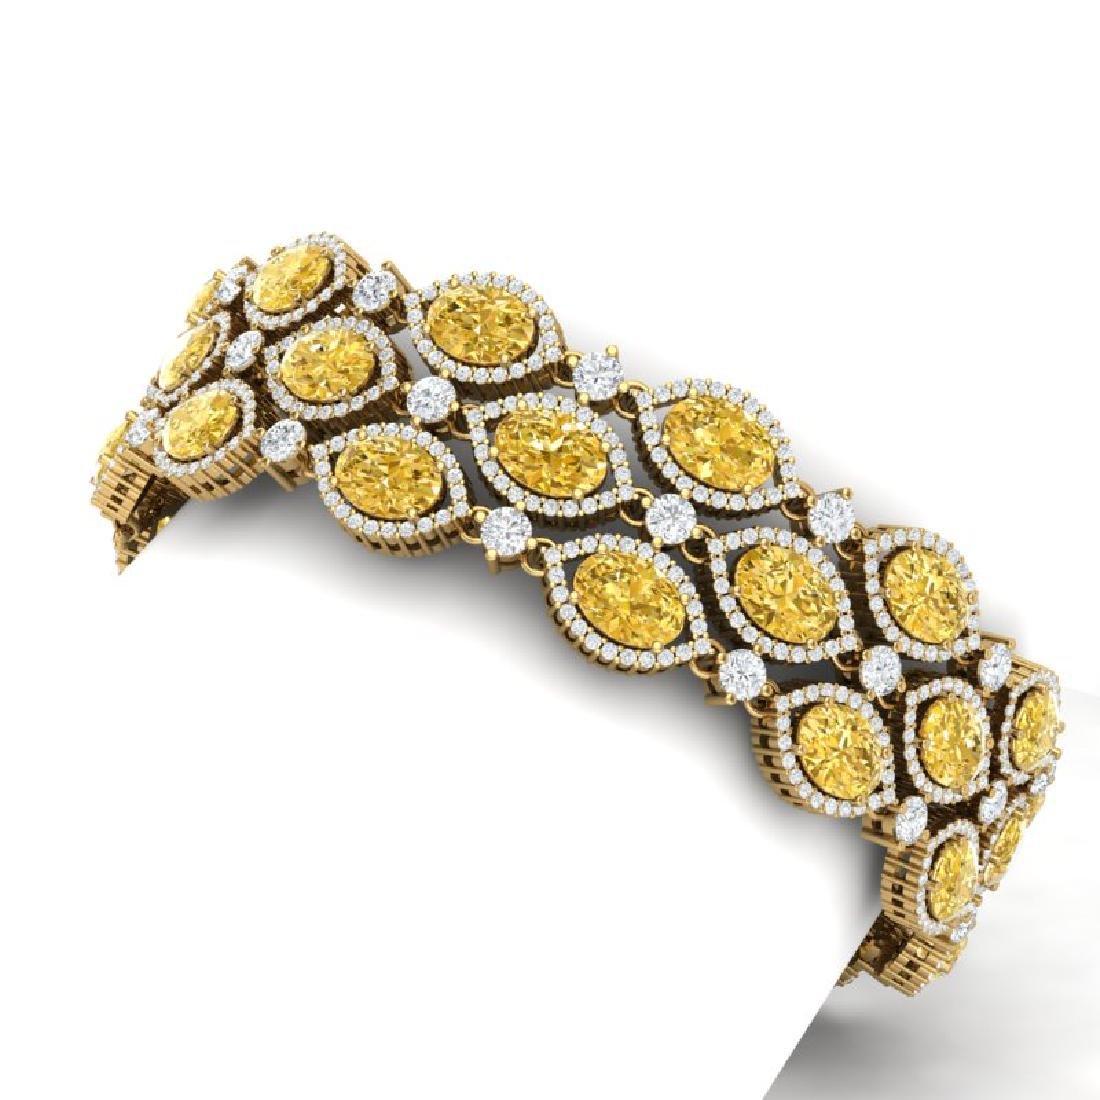 43.84 CTW Royalty Canary Citrine & VS Diamond Bracelet - 2